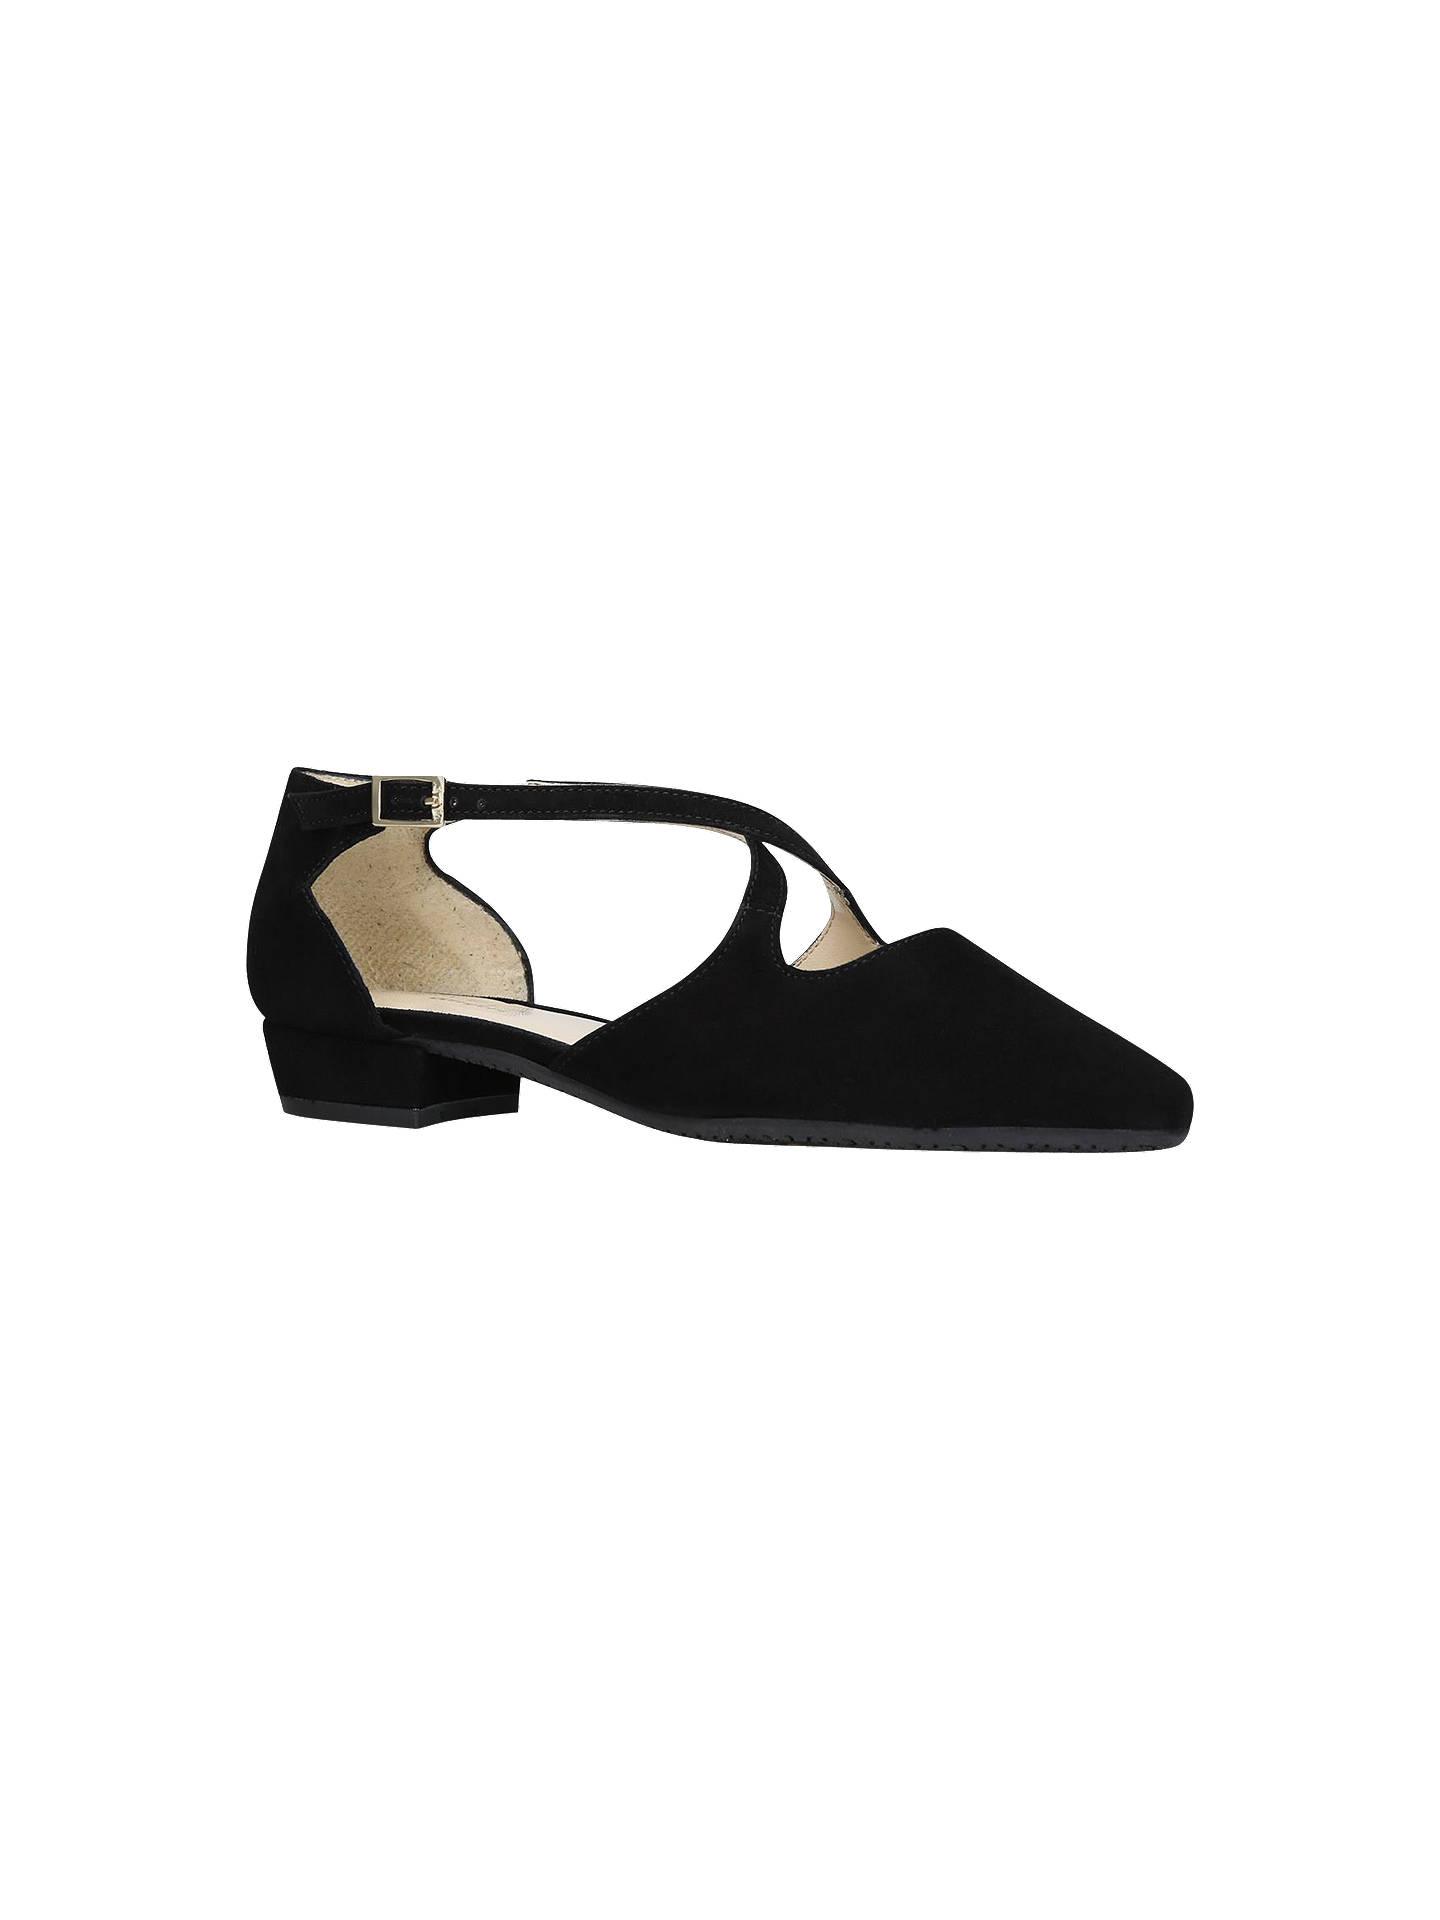 1d080552f48 Buy Carvela Comfort Amour Low Heel Court Shoes